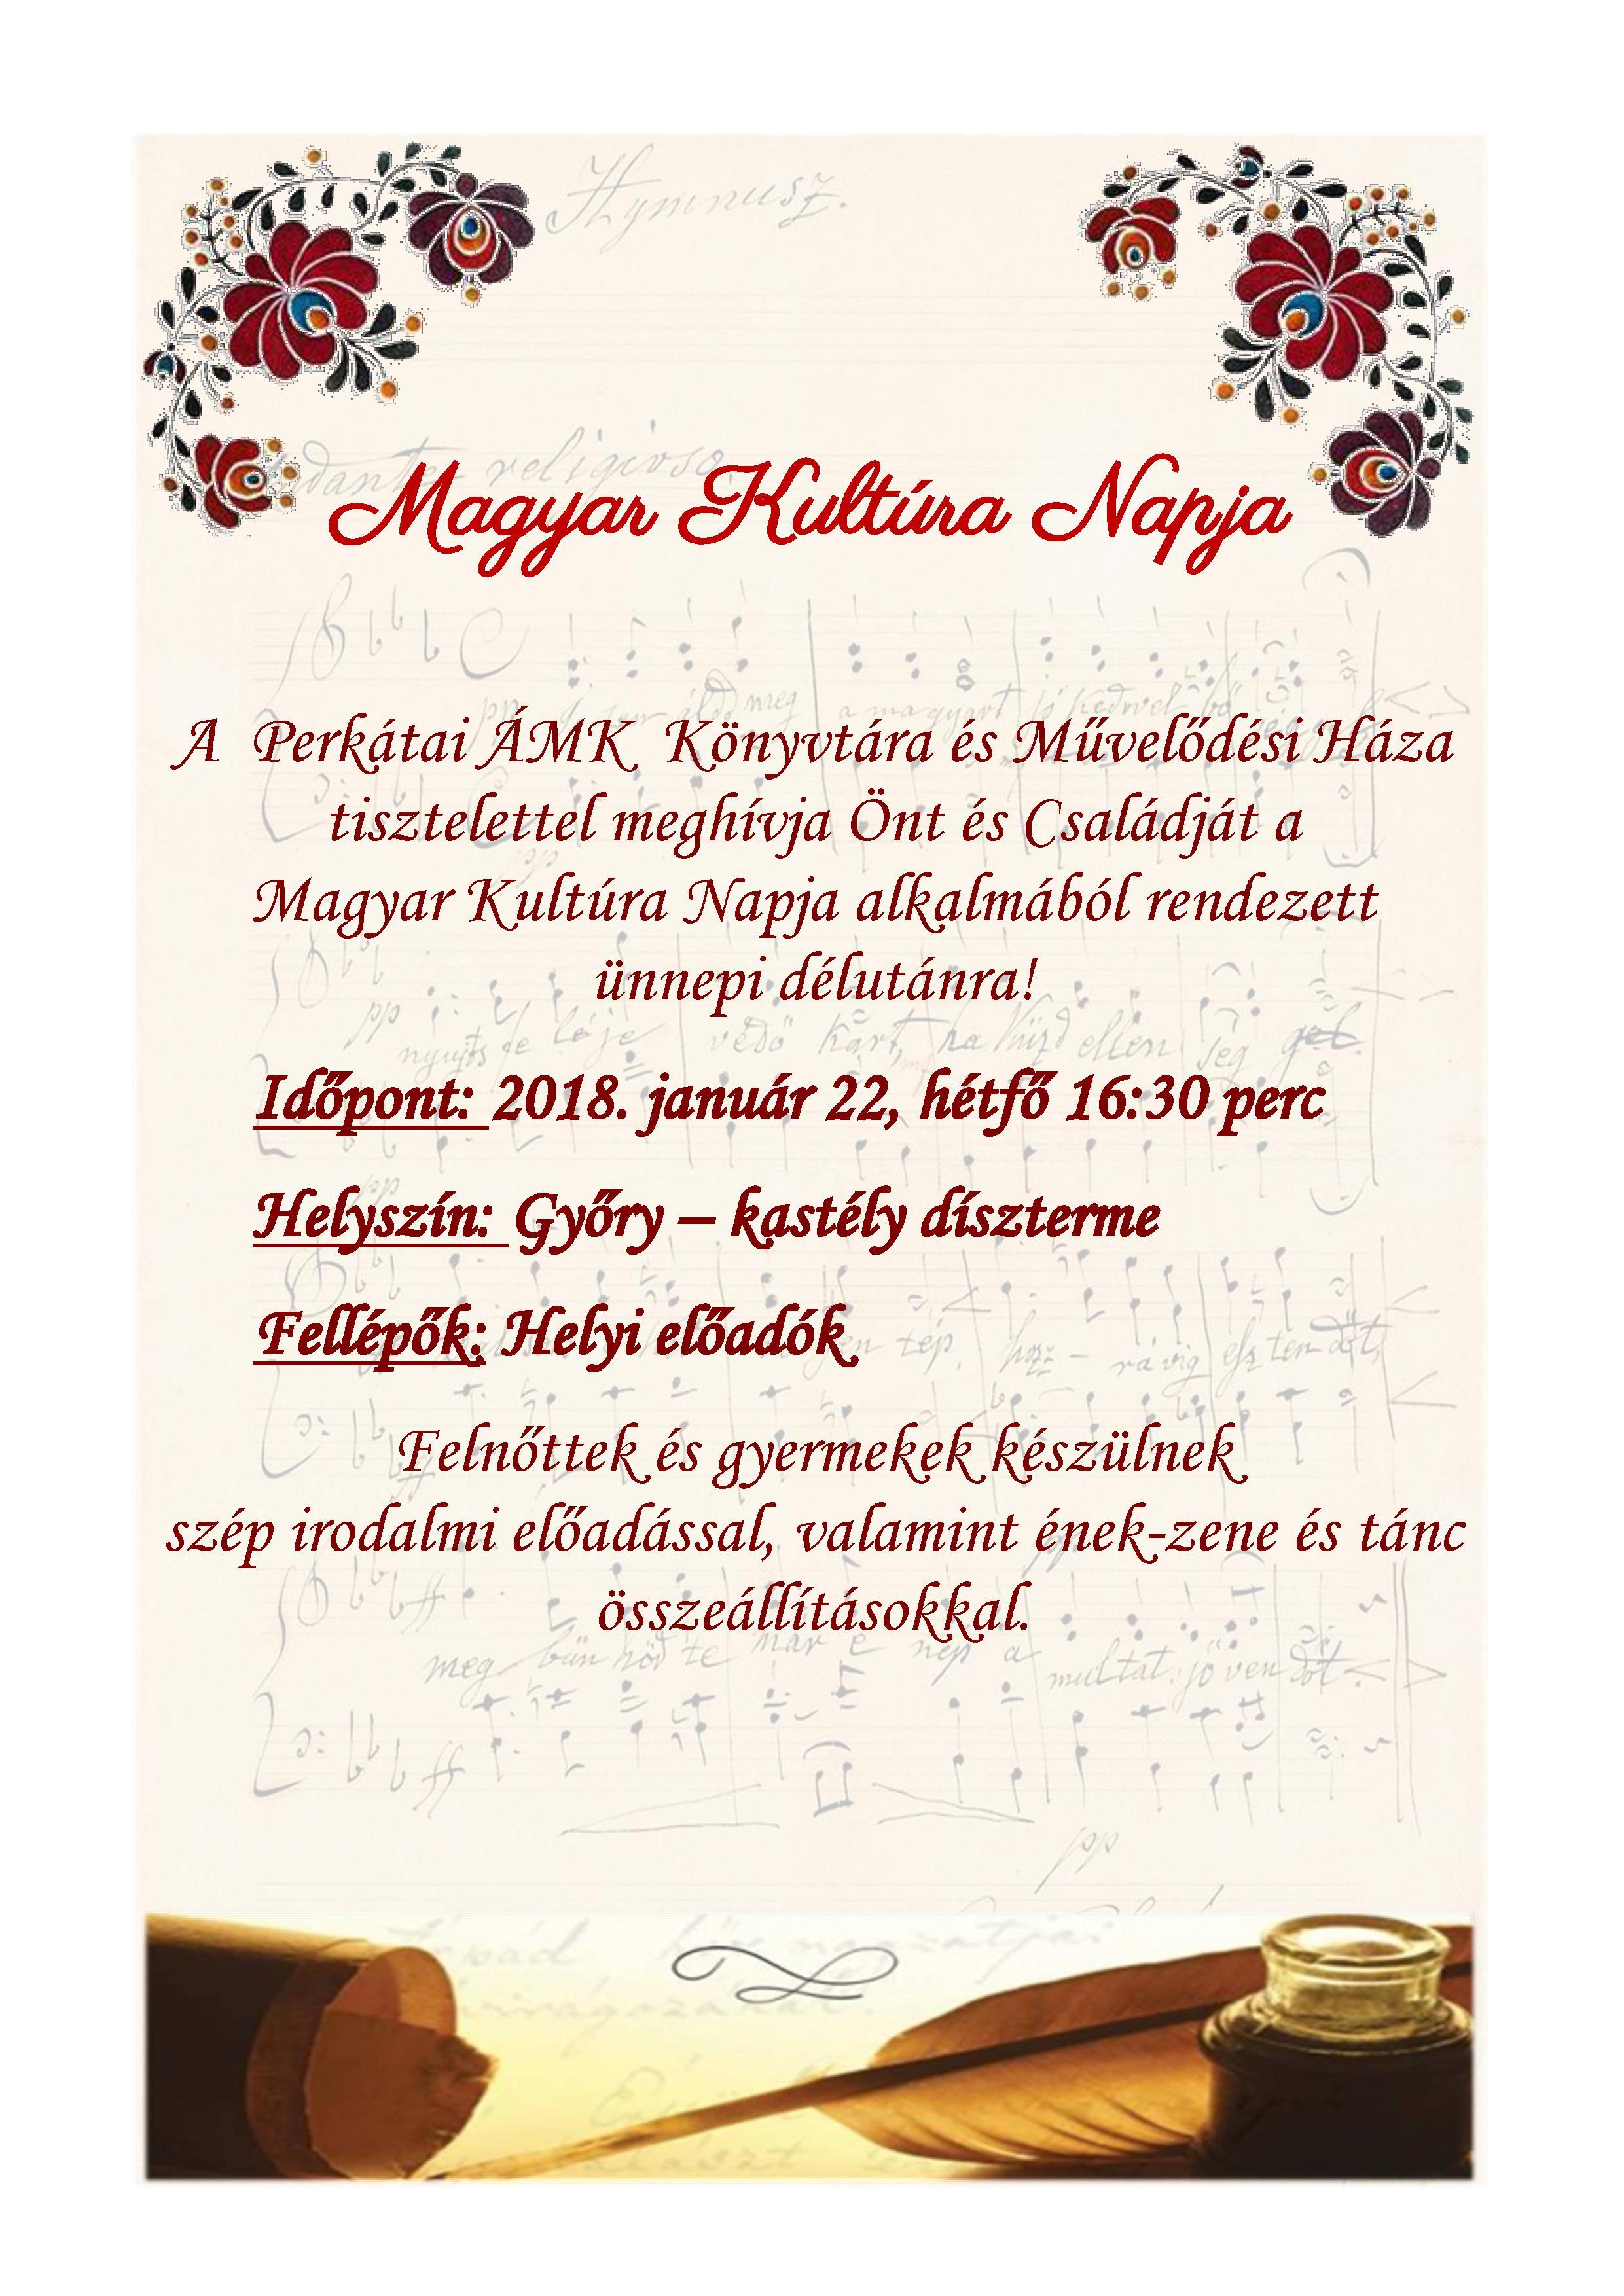 Magyar Kultúra Napja, Perkáta, 2018.01.22., 16:30 óra